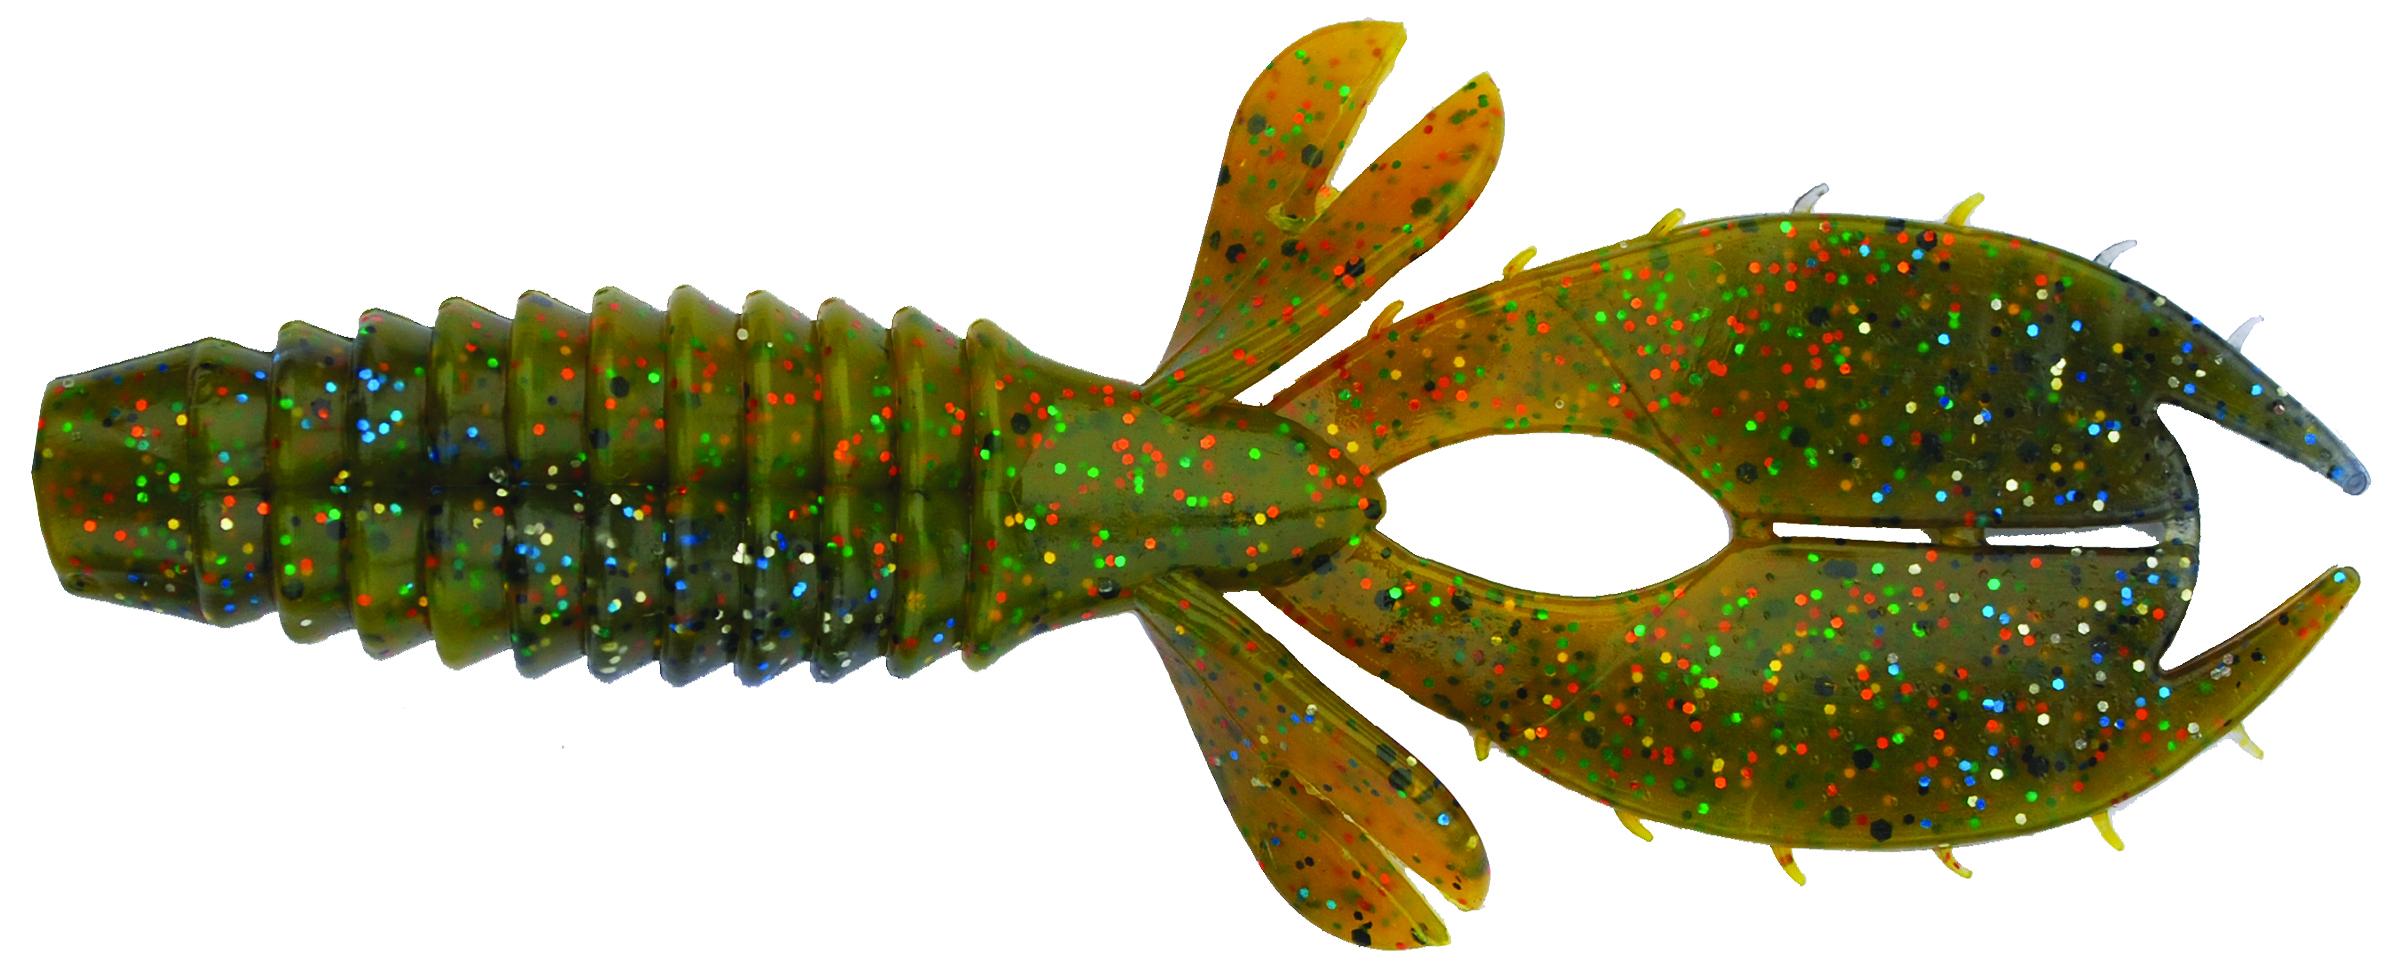 Big Bite Baits - YoMama - 4 inch - YO417 - SUNFISH SWIRL